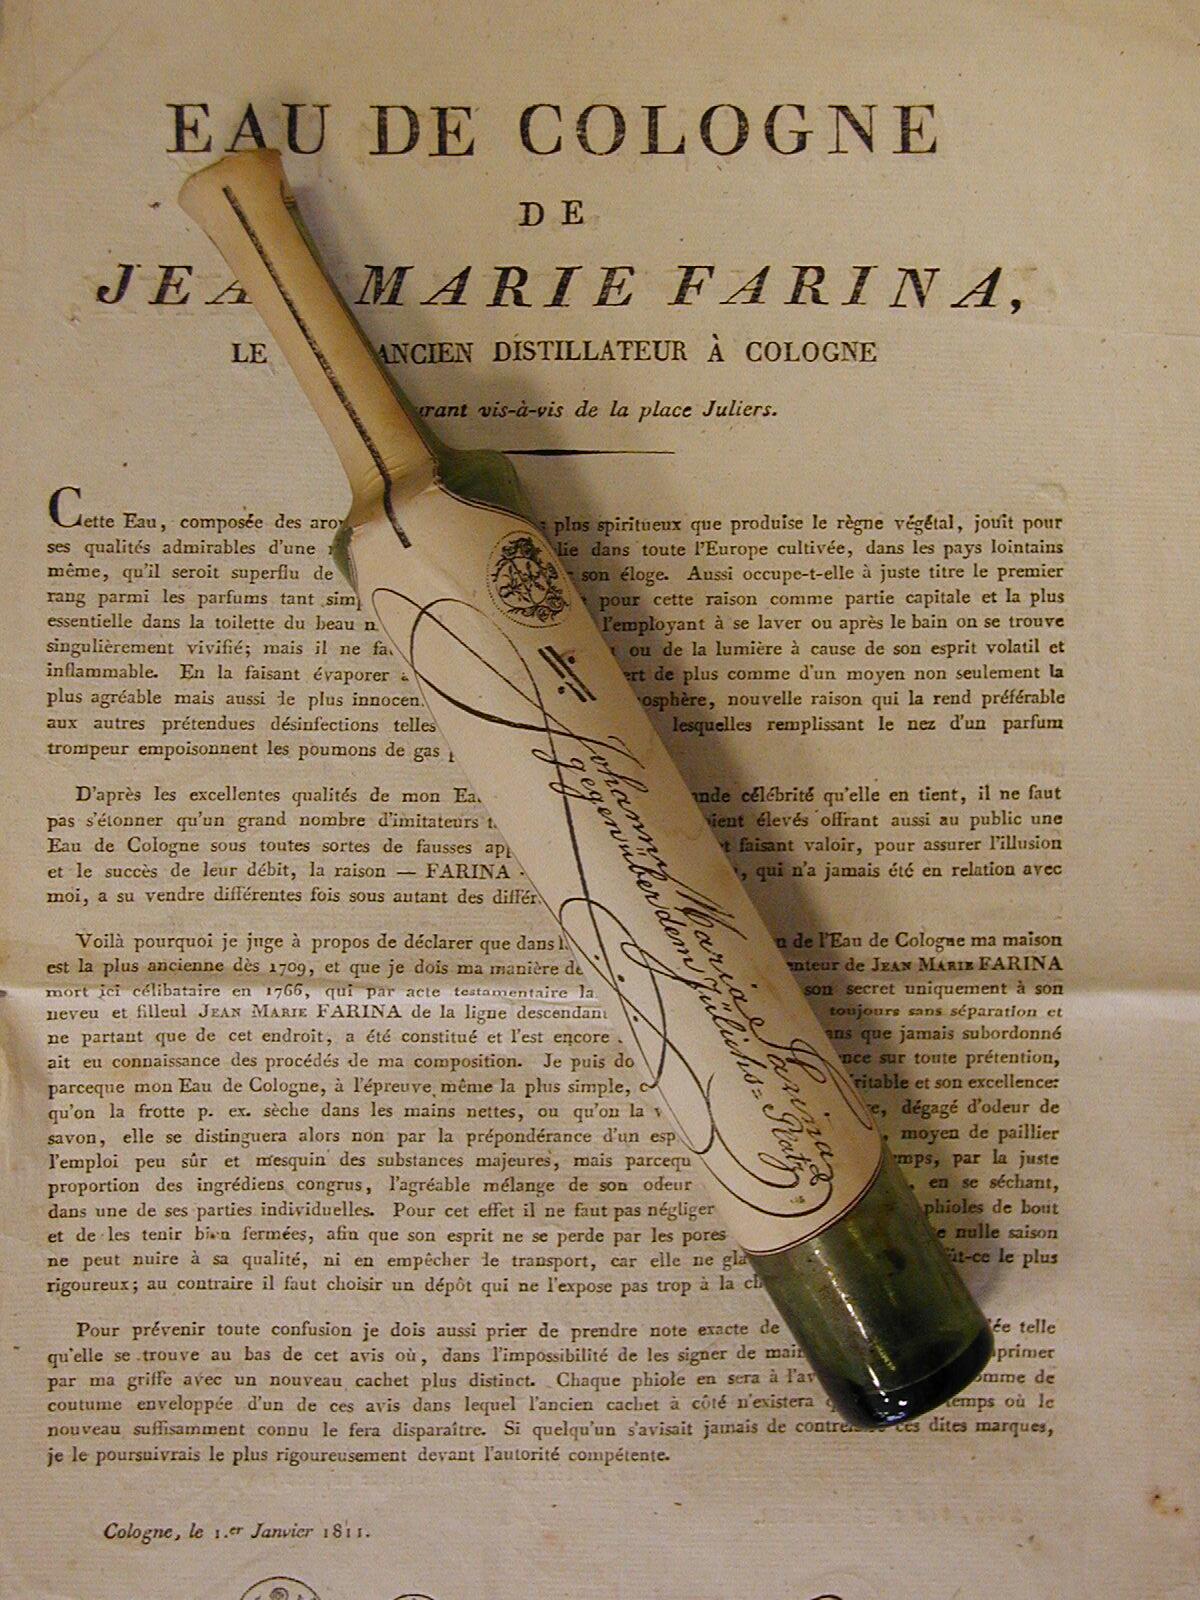 Rosolie, 1811